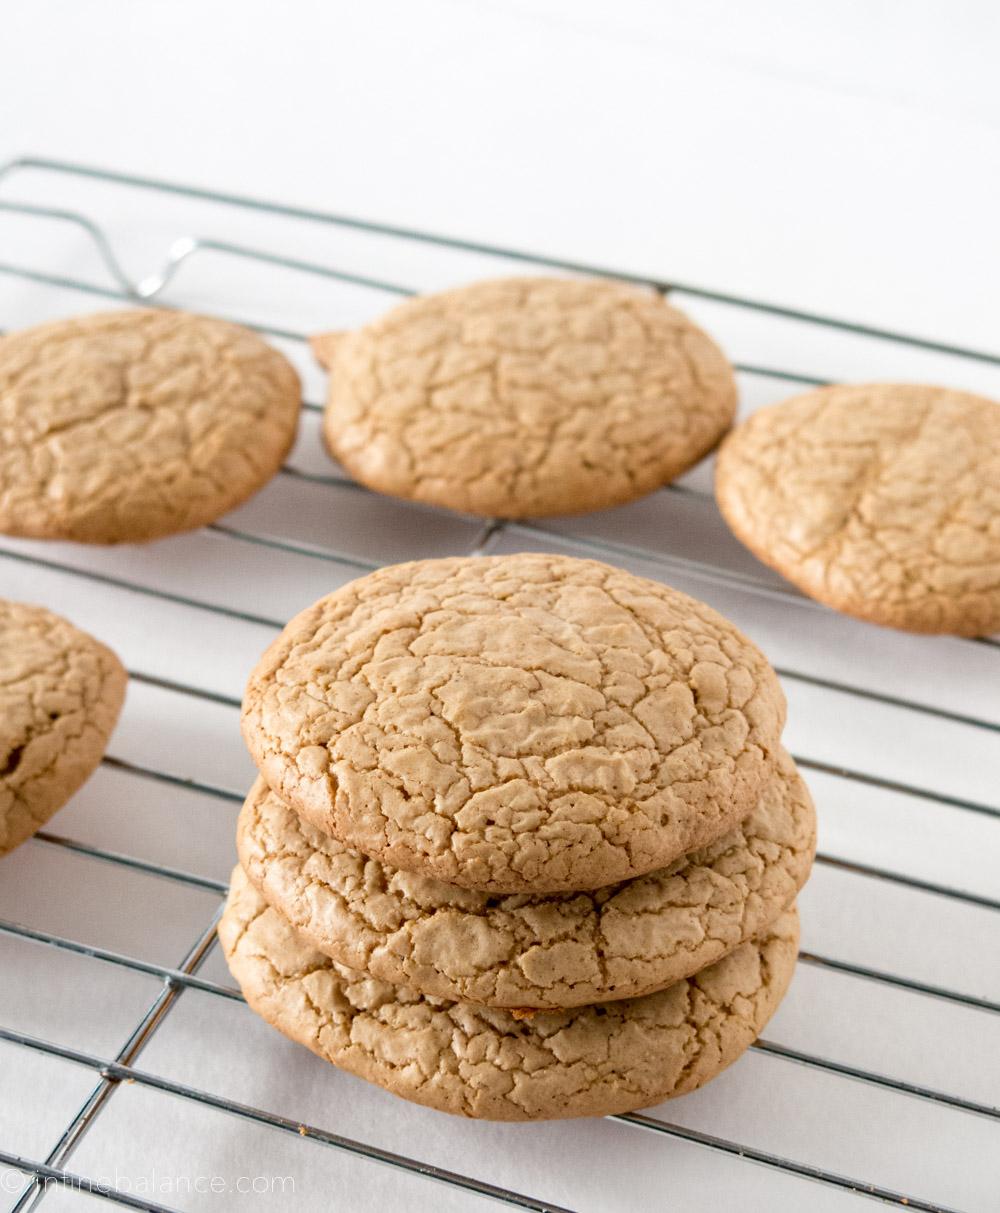 Peanut Butter Crinkle Cookies | www.infinebalance.com #gluten-free #recipe